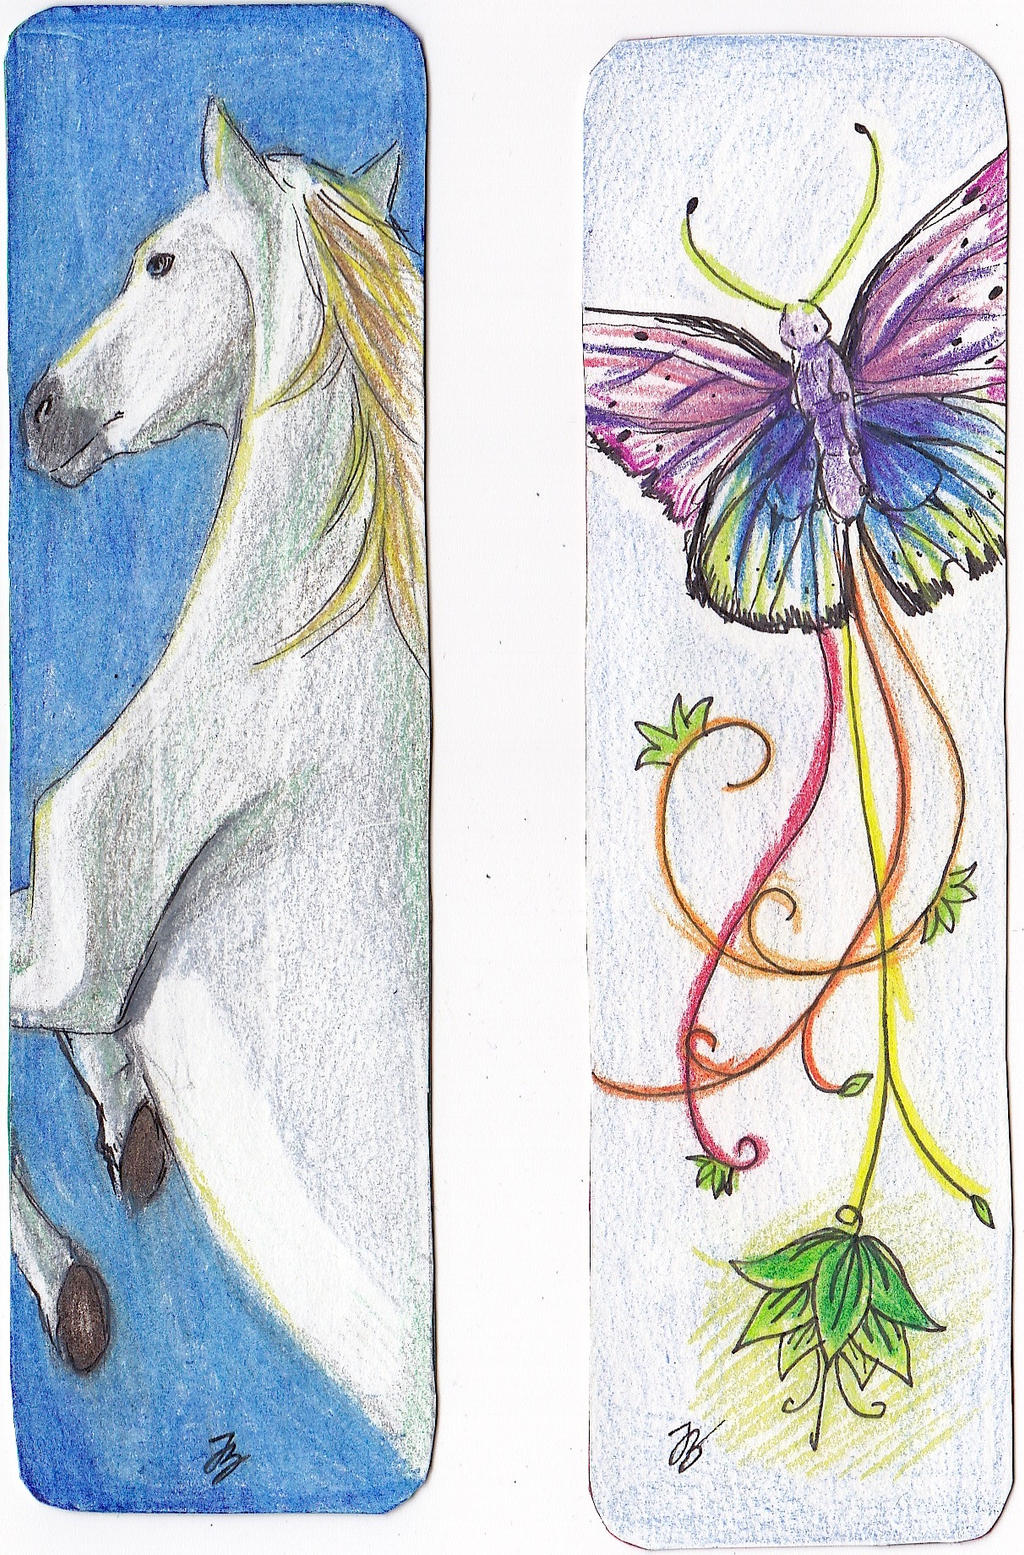 New Bookmark Designs Set 3 By Xiaooyu On DeviantArt